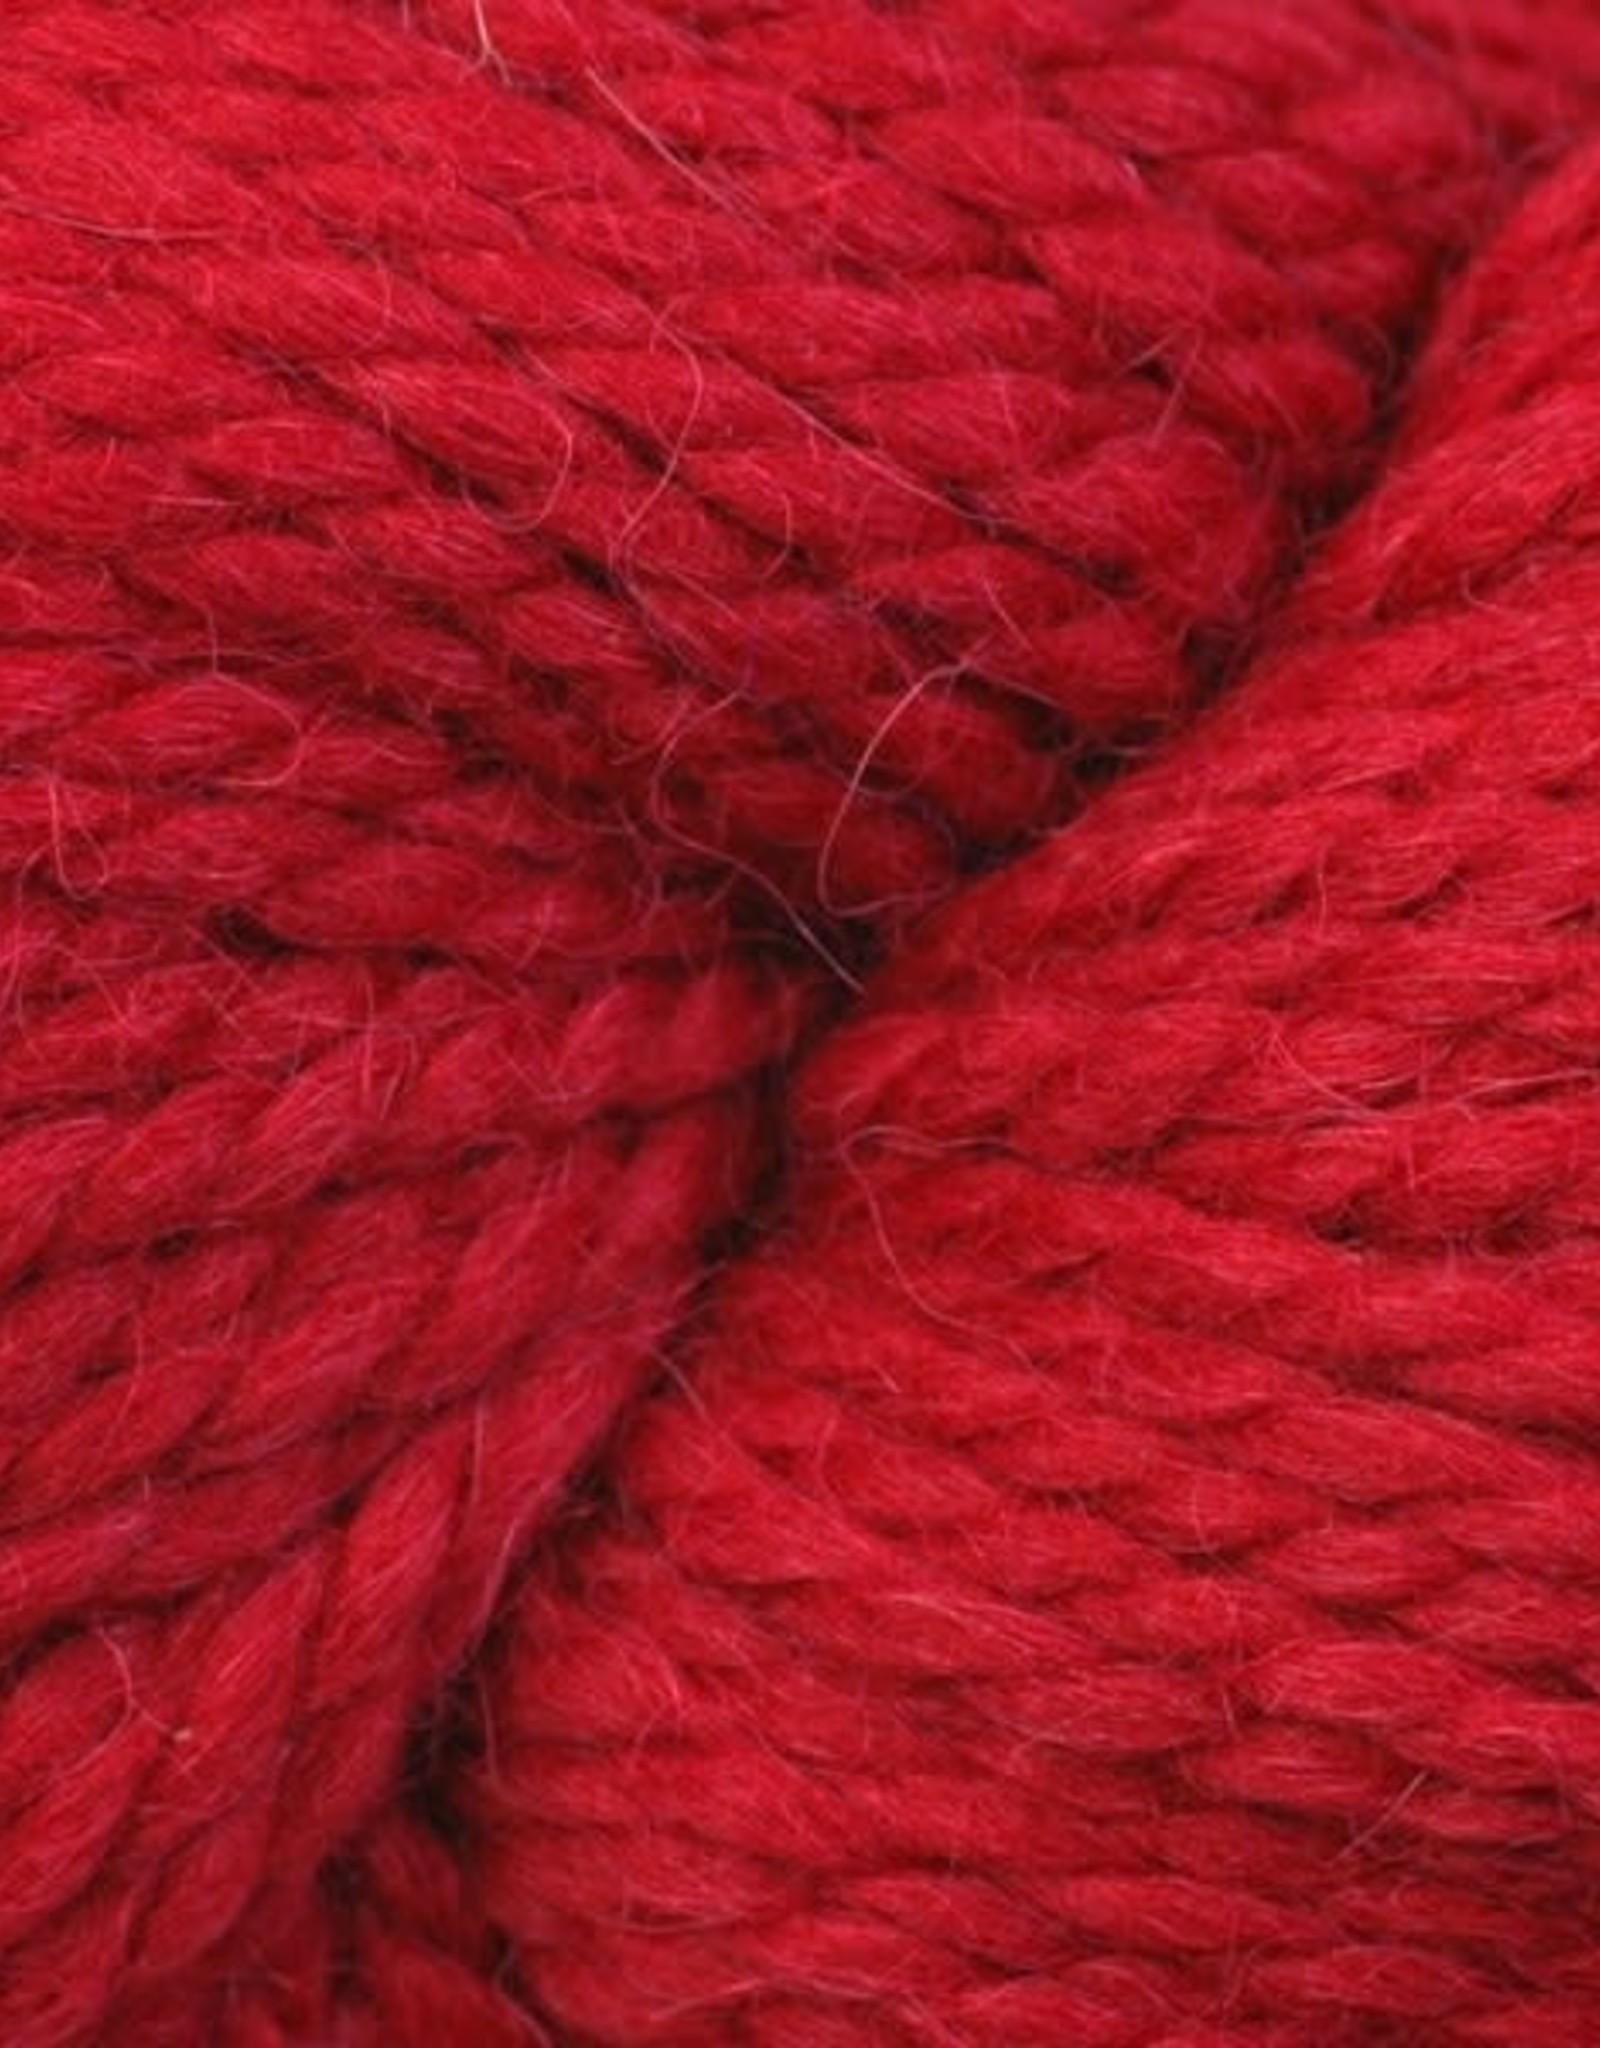 Berroco Ultra Alpaca Chunky 7234 cardinal